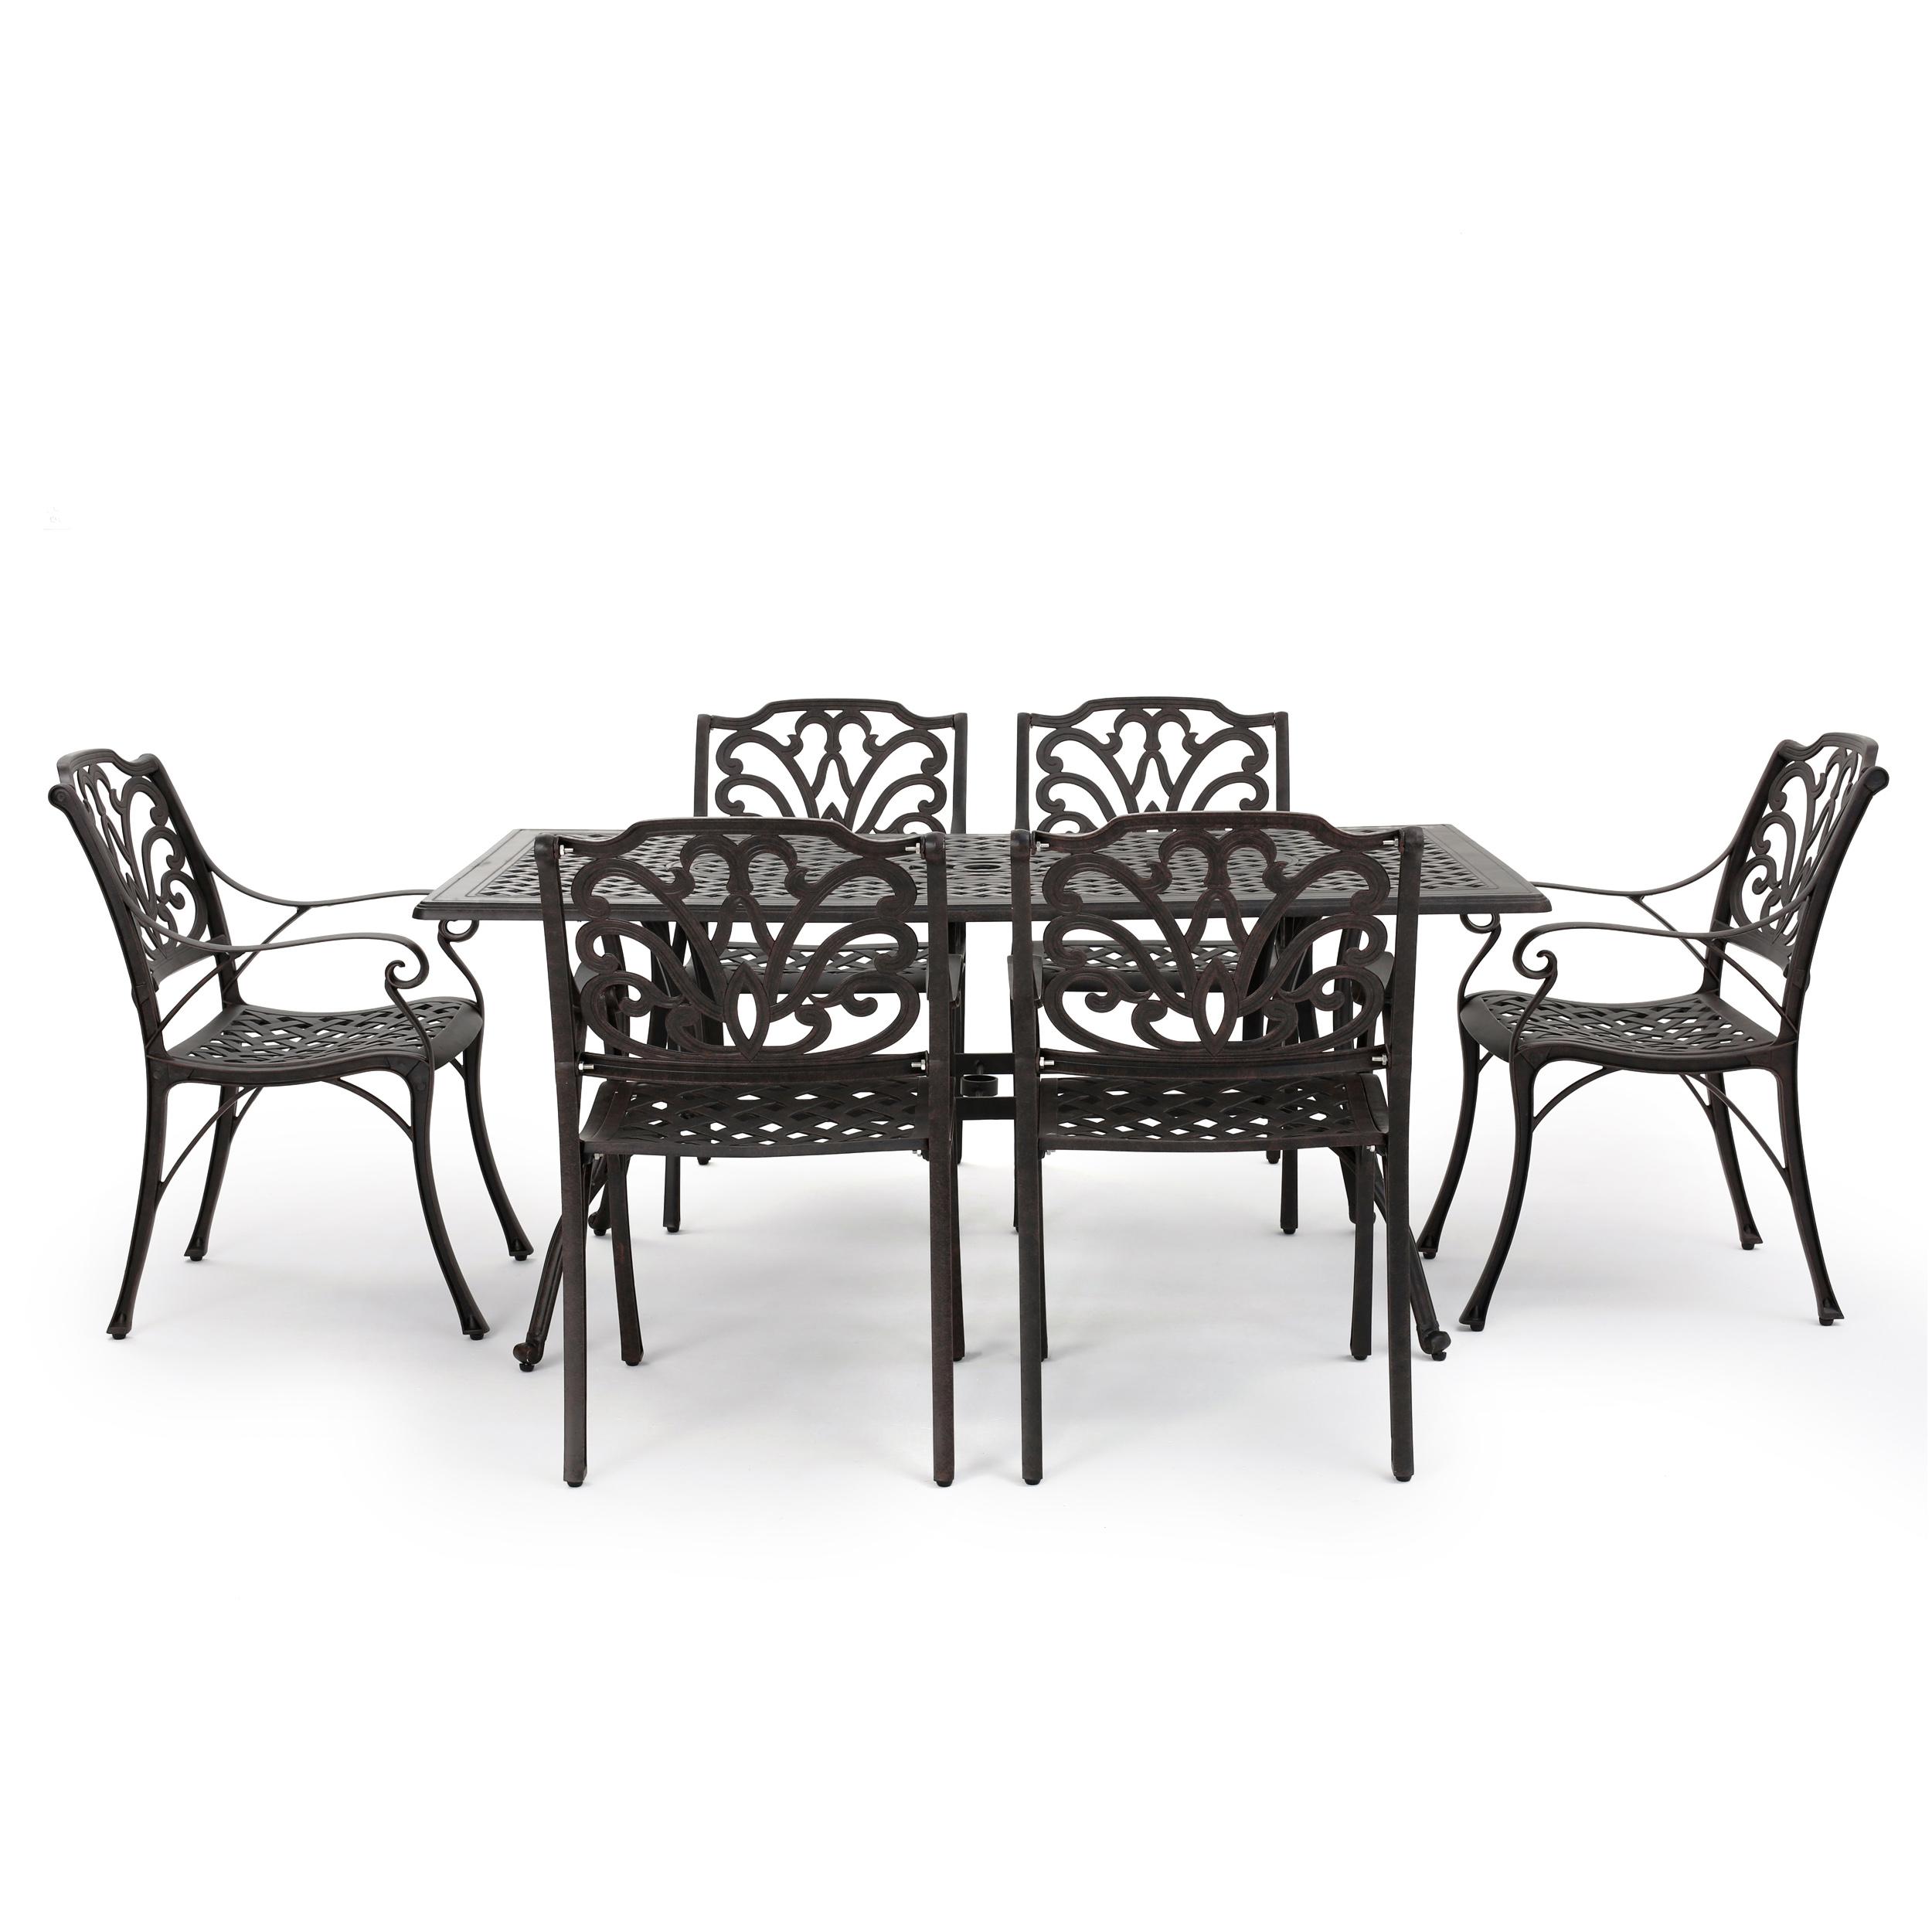 Gonzo Outdoor 7 Piece Cast Aluminum Rectangular Dining Set, Bronze